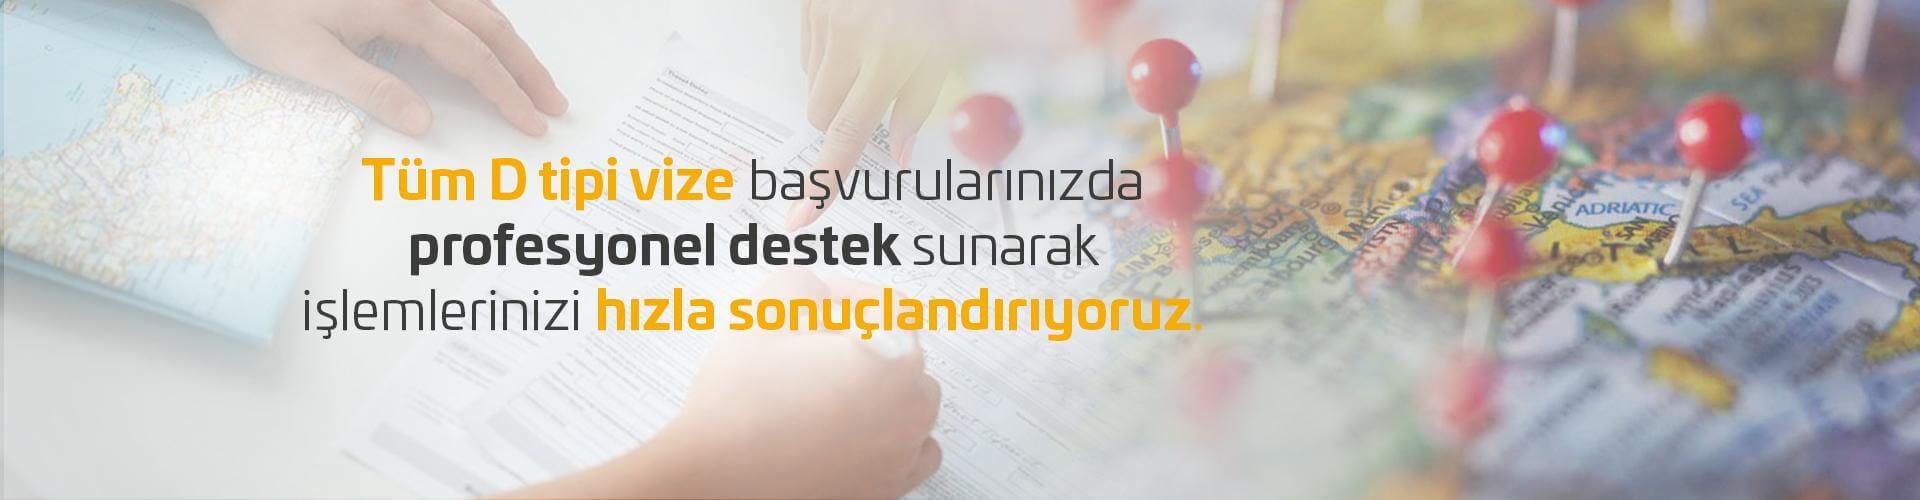 3-anasayfa_slider_3.jpg